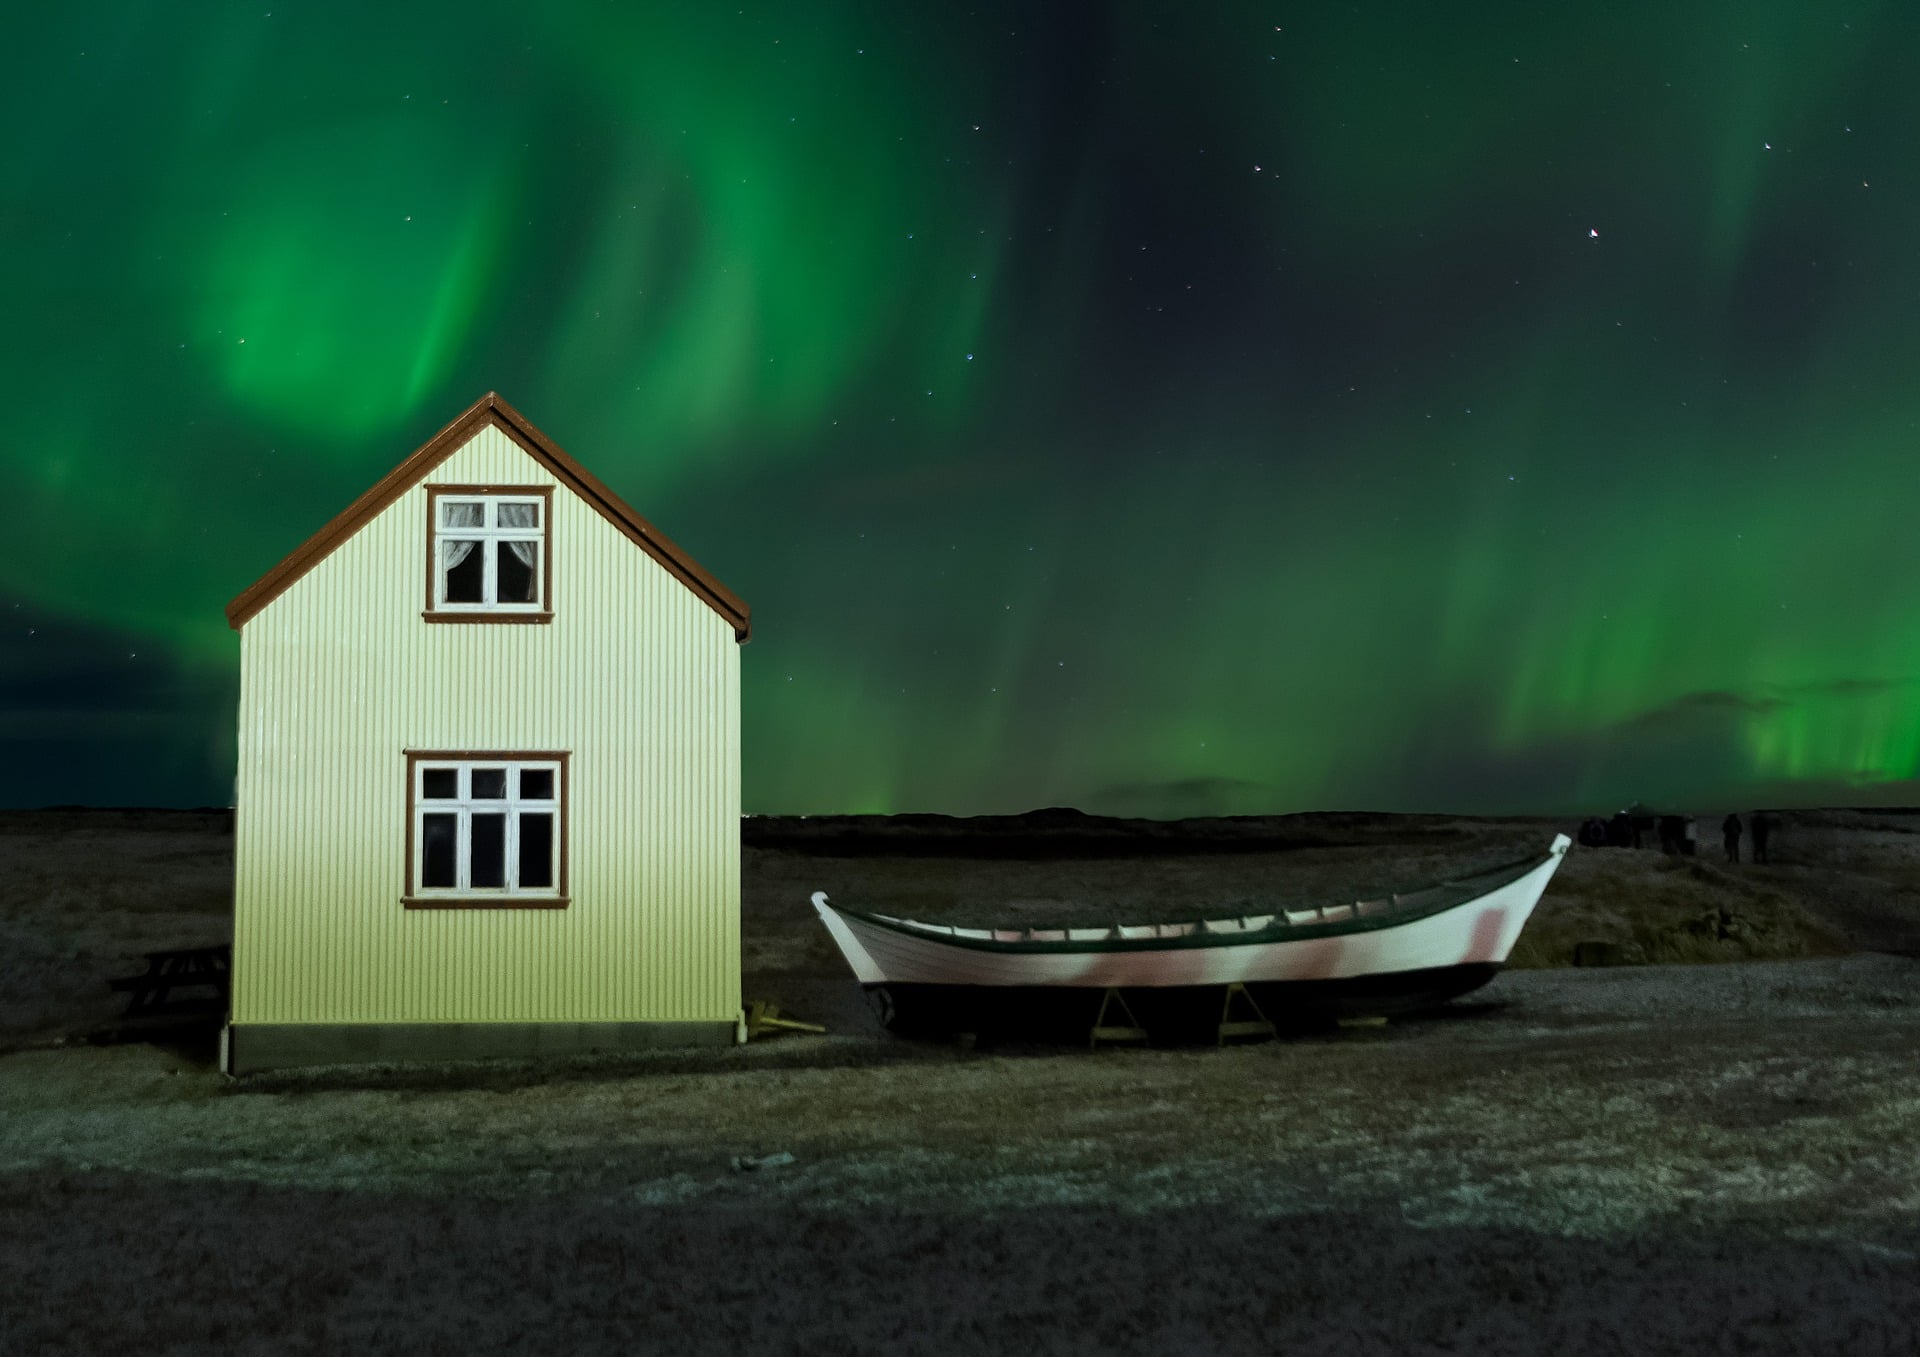 Aurora Borealis 2173562 1920 Paxton Visuals